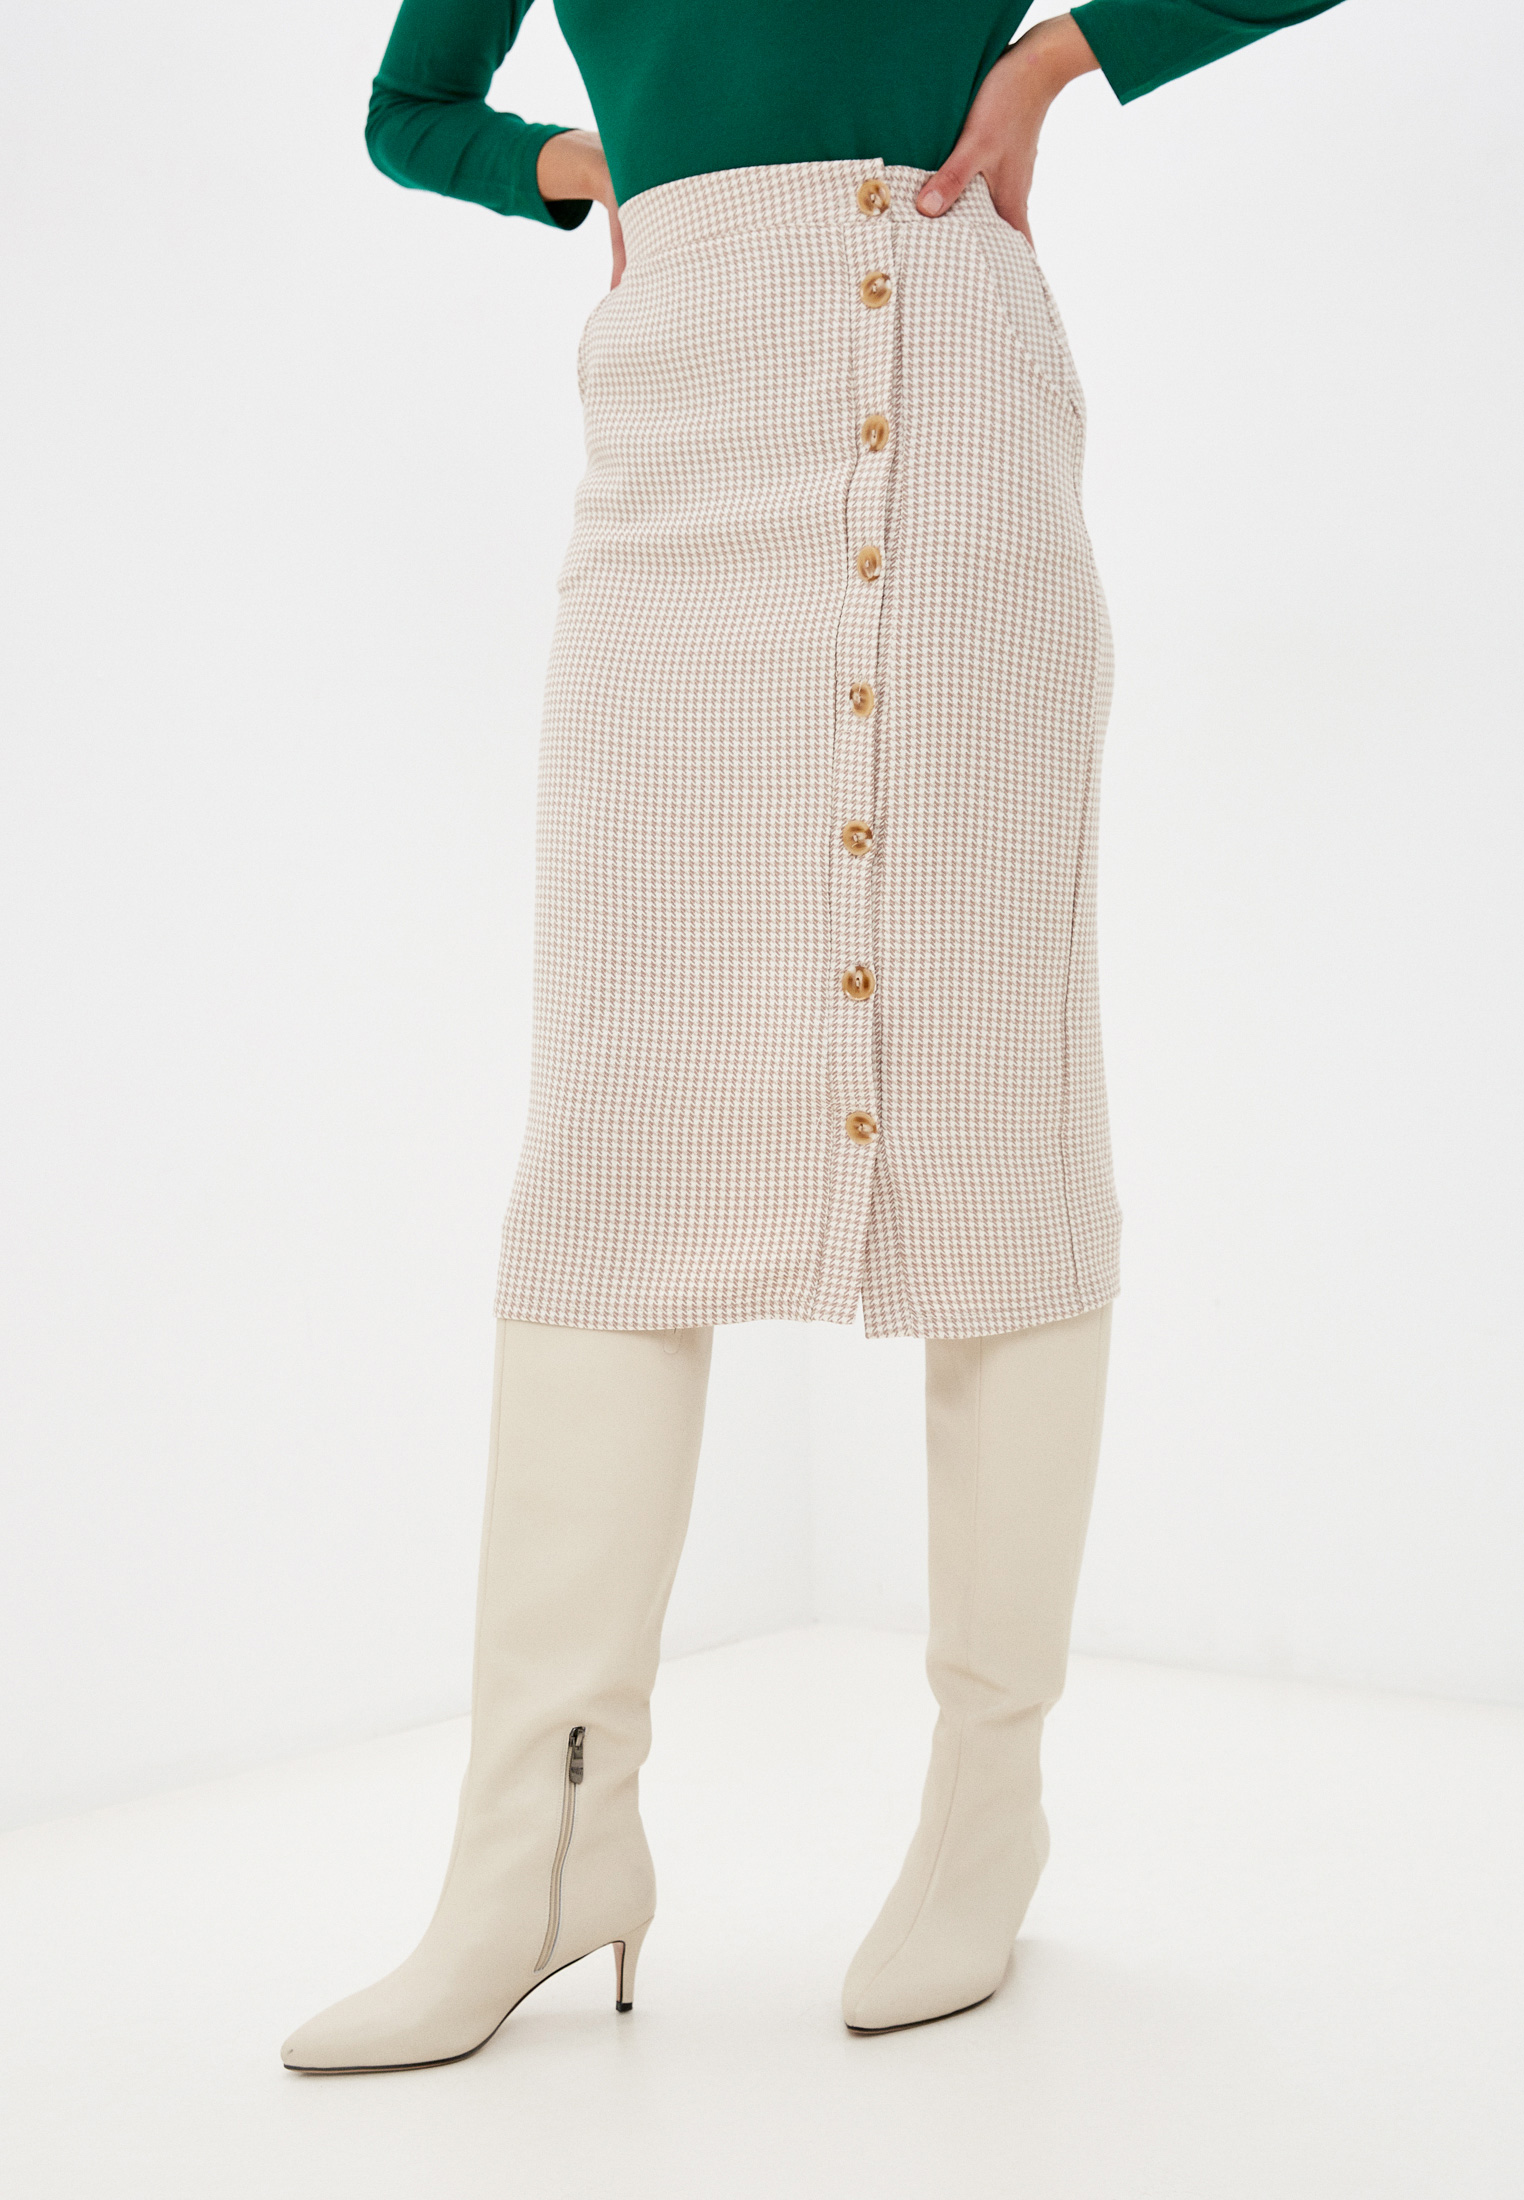 Прямая юбка Pinkkarrot Юбка Pinkkarrot